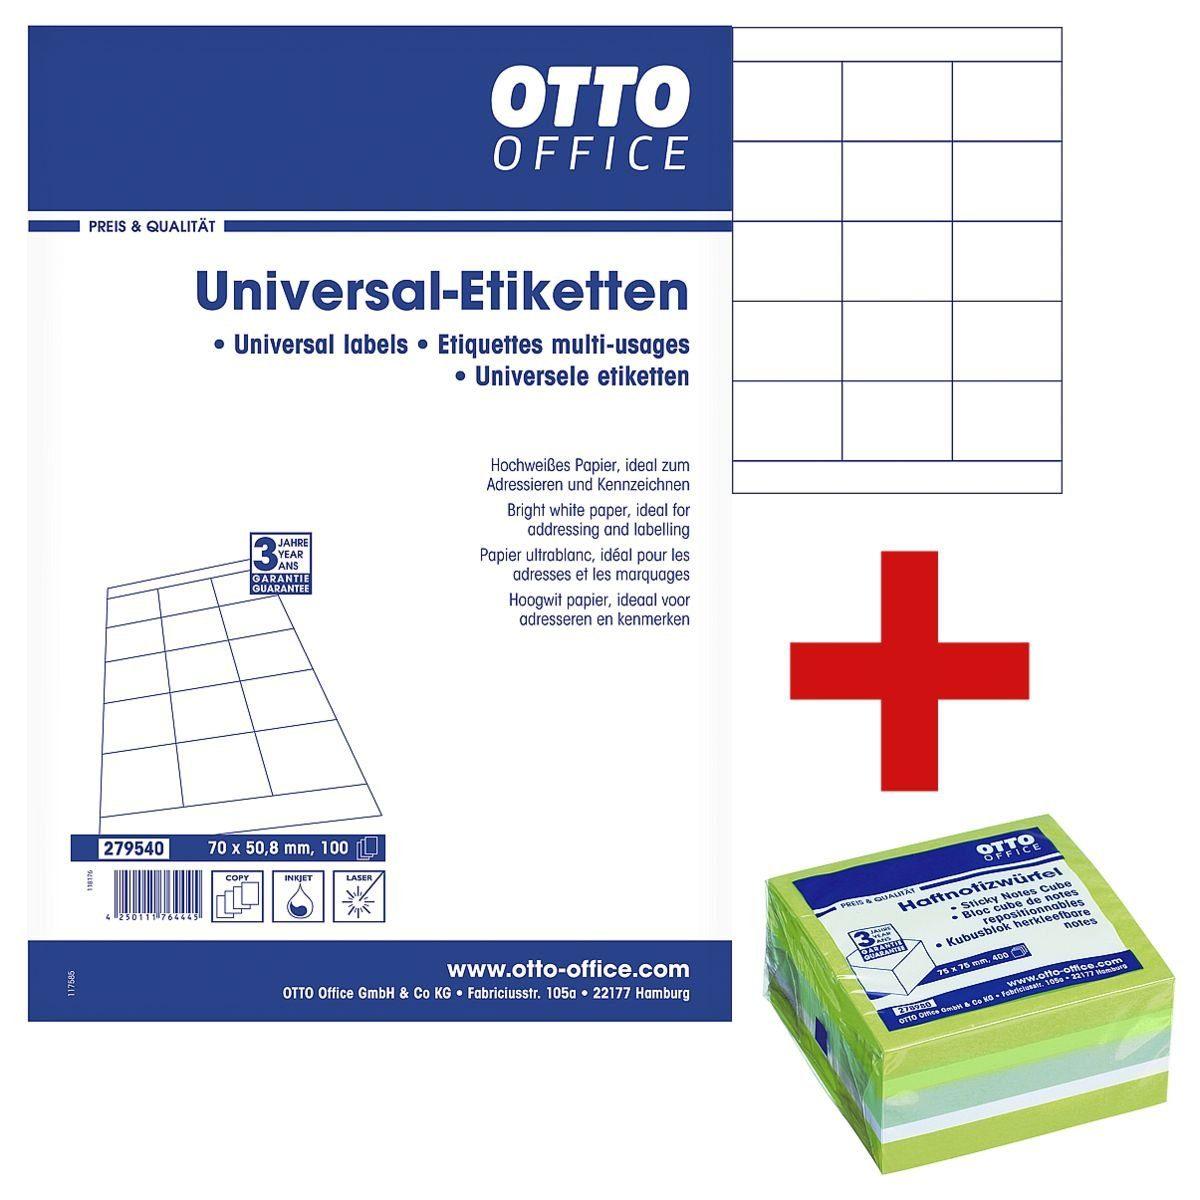 OTTO Office Standard 1500er-Pack Universal Klebeetiketten inkl. Haftnotizwürfel 1 Set